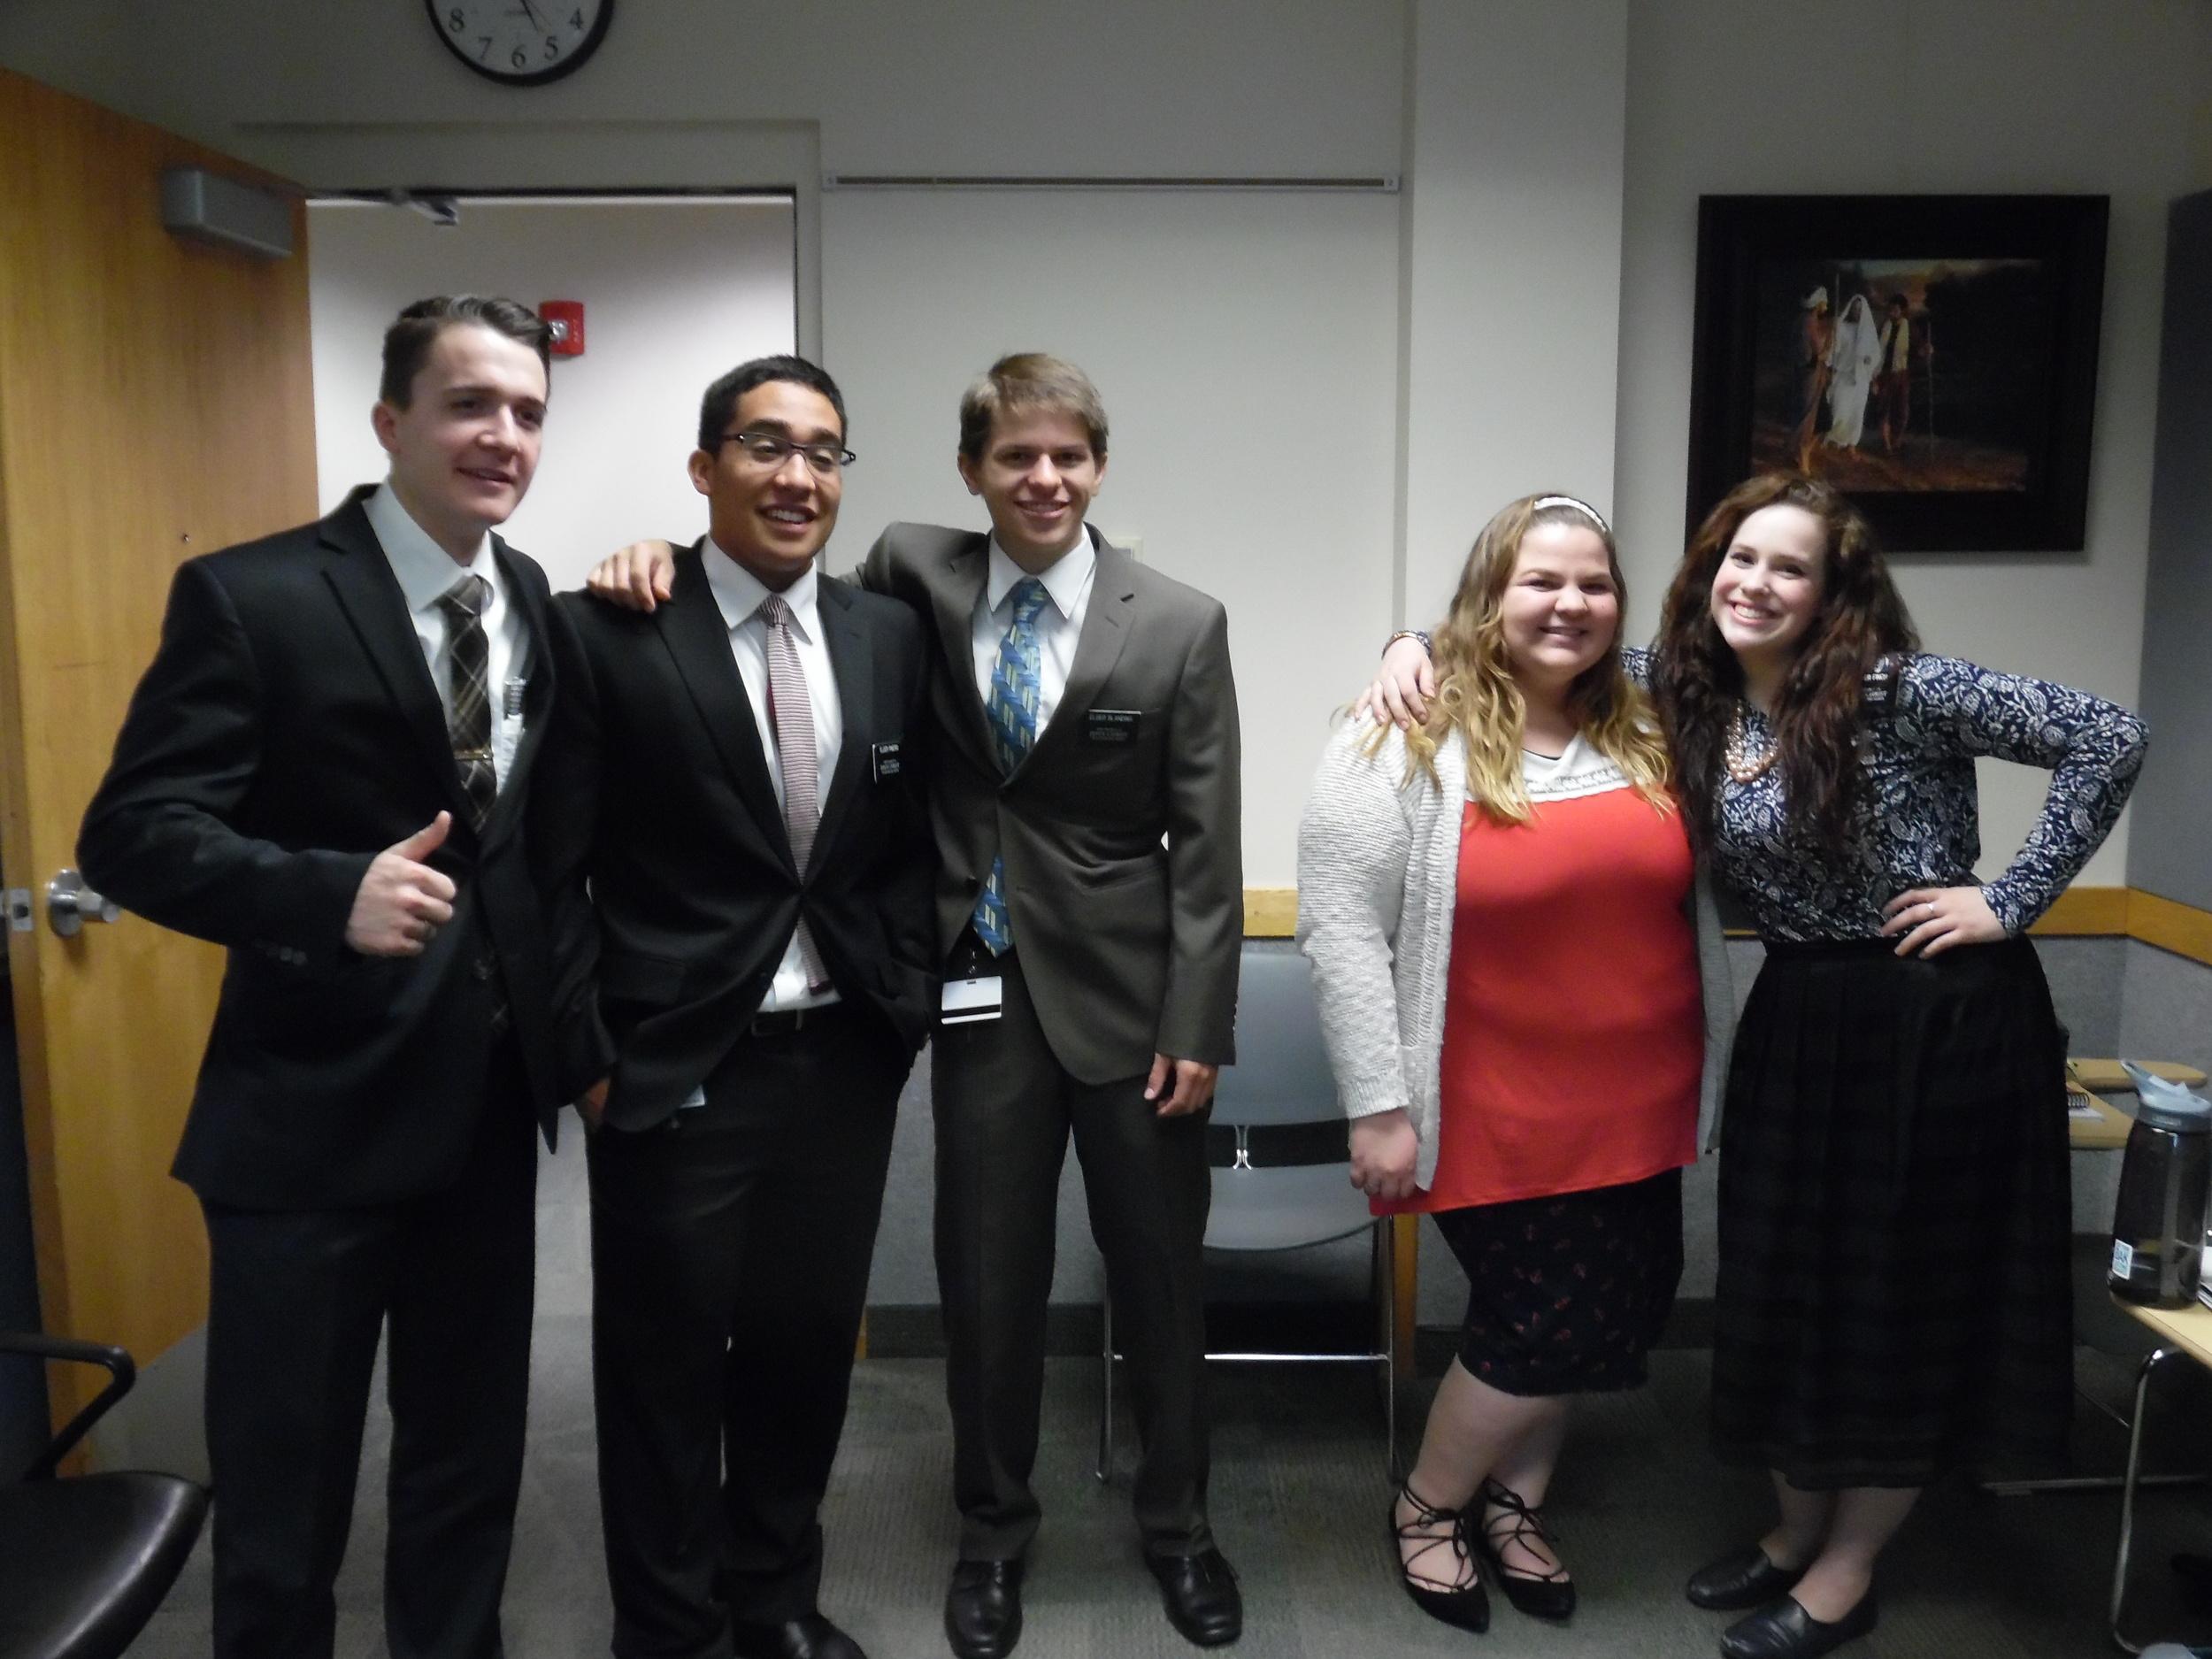 Elder Cahoon, Elder Pinero, Elder Matthew Blanding, Sister Tobin and Sister Finch Matt's District at the MTC